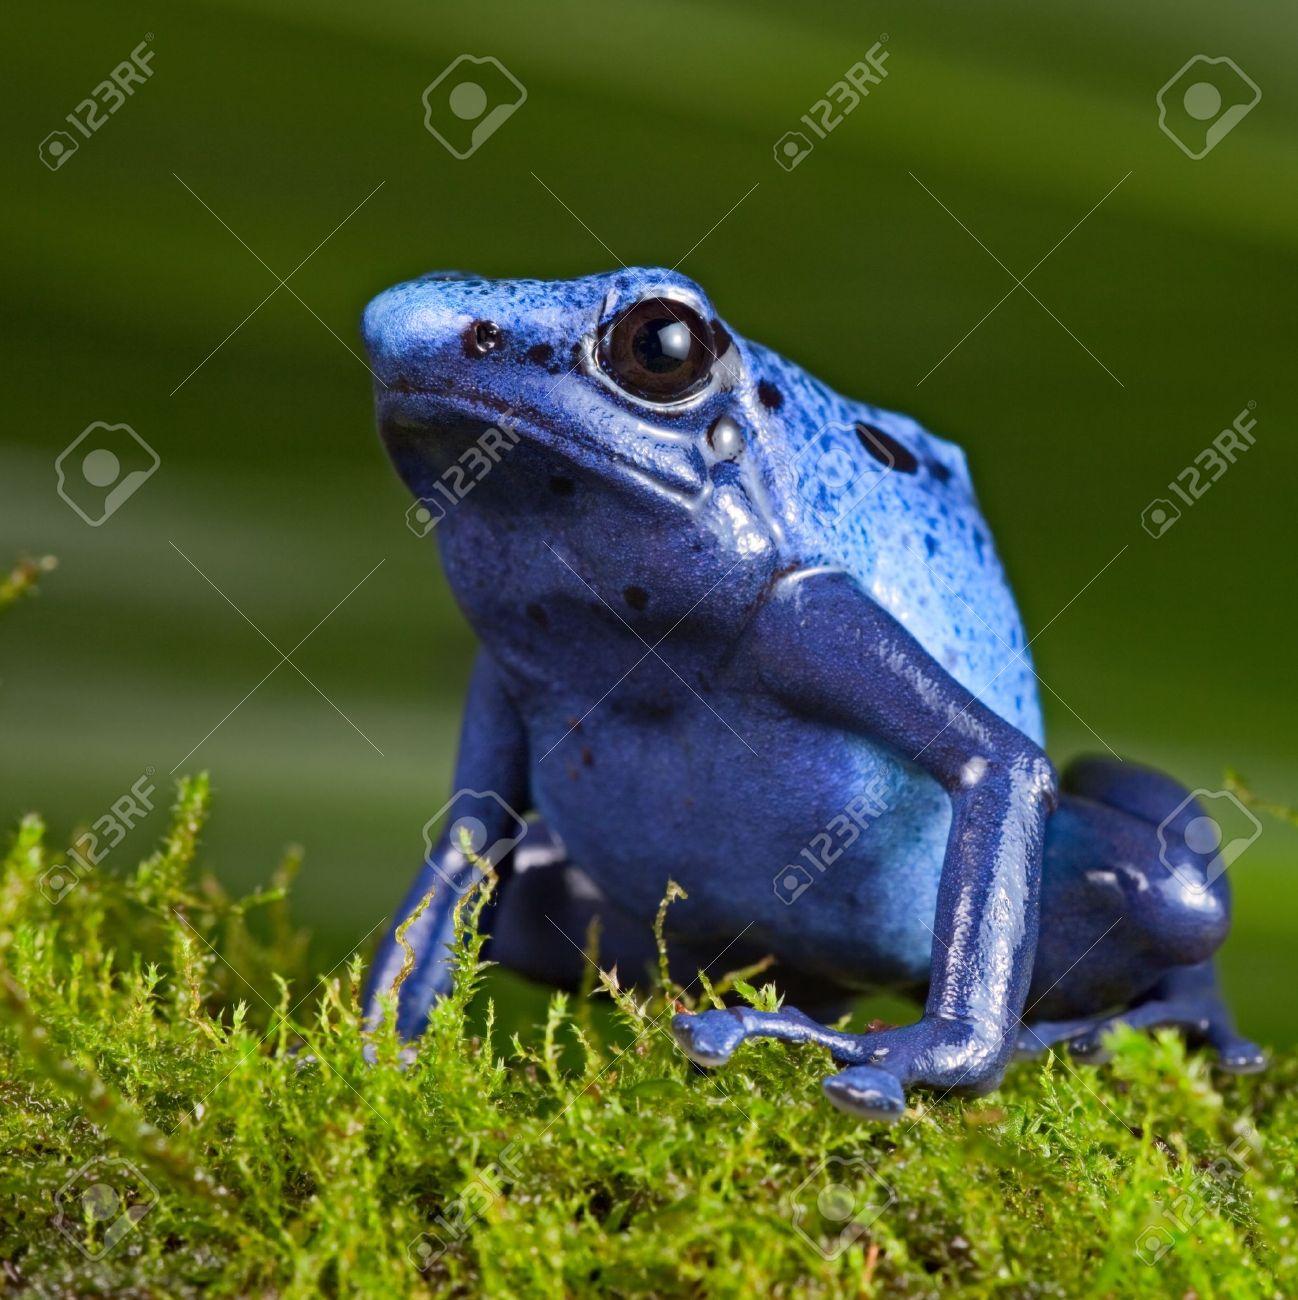 blue poison dart frog, poisonous animal of Amazon rainforest in Suriname, Endangered species kep as exotic pet in rain forest terrarium, jungle amphibian Stock Photo - 11289466